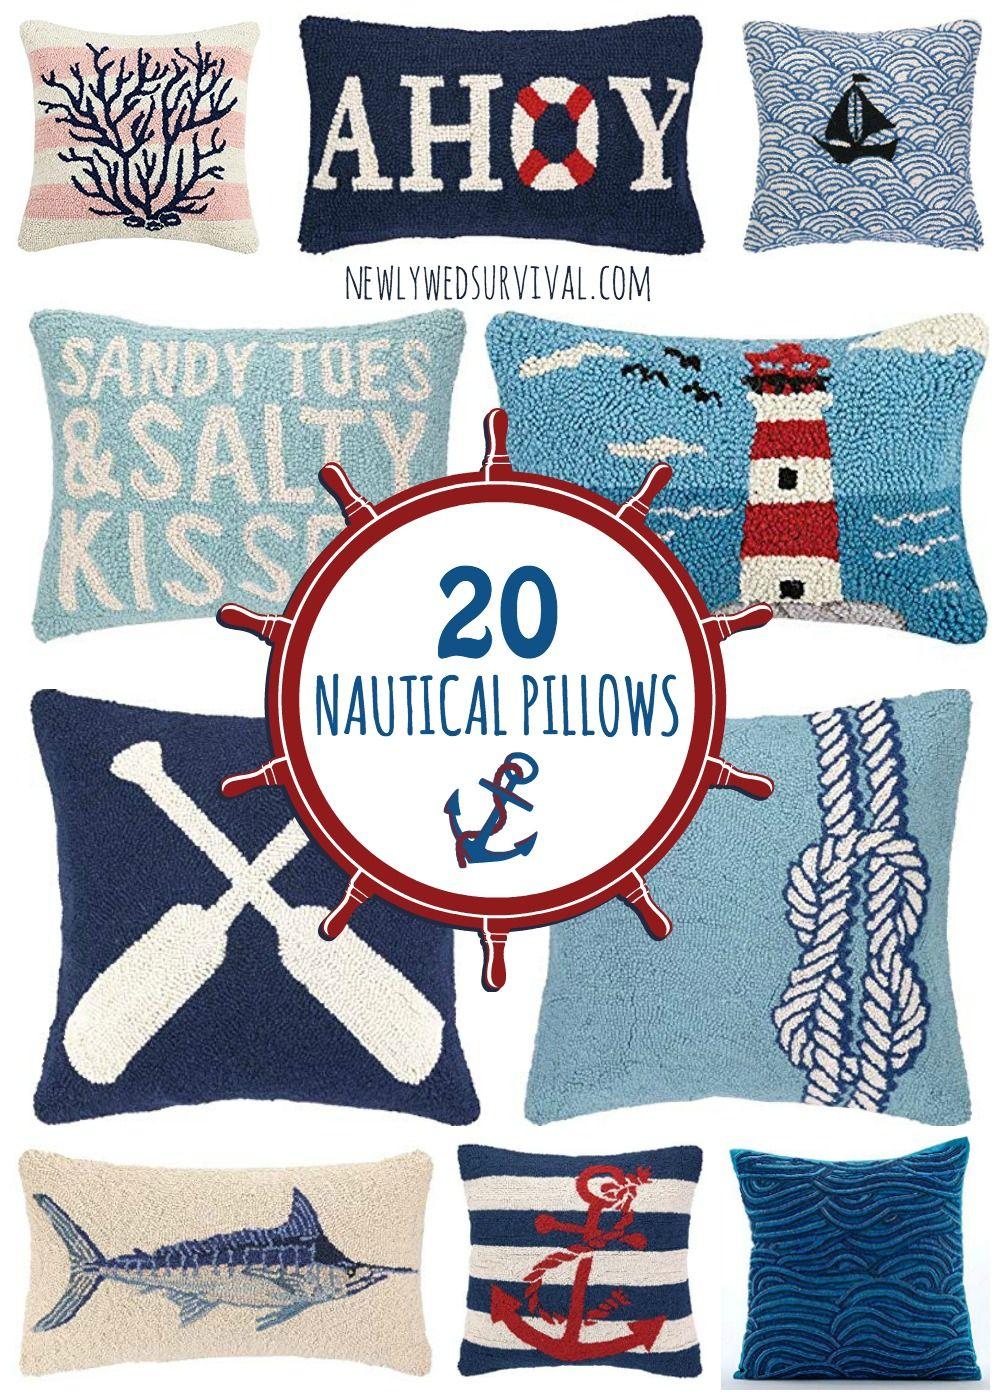 20 Nautical Throw Pillows Nautical Throw Pillows Nautical